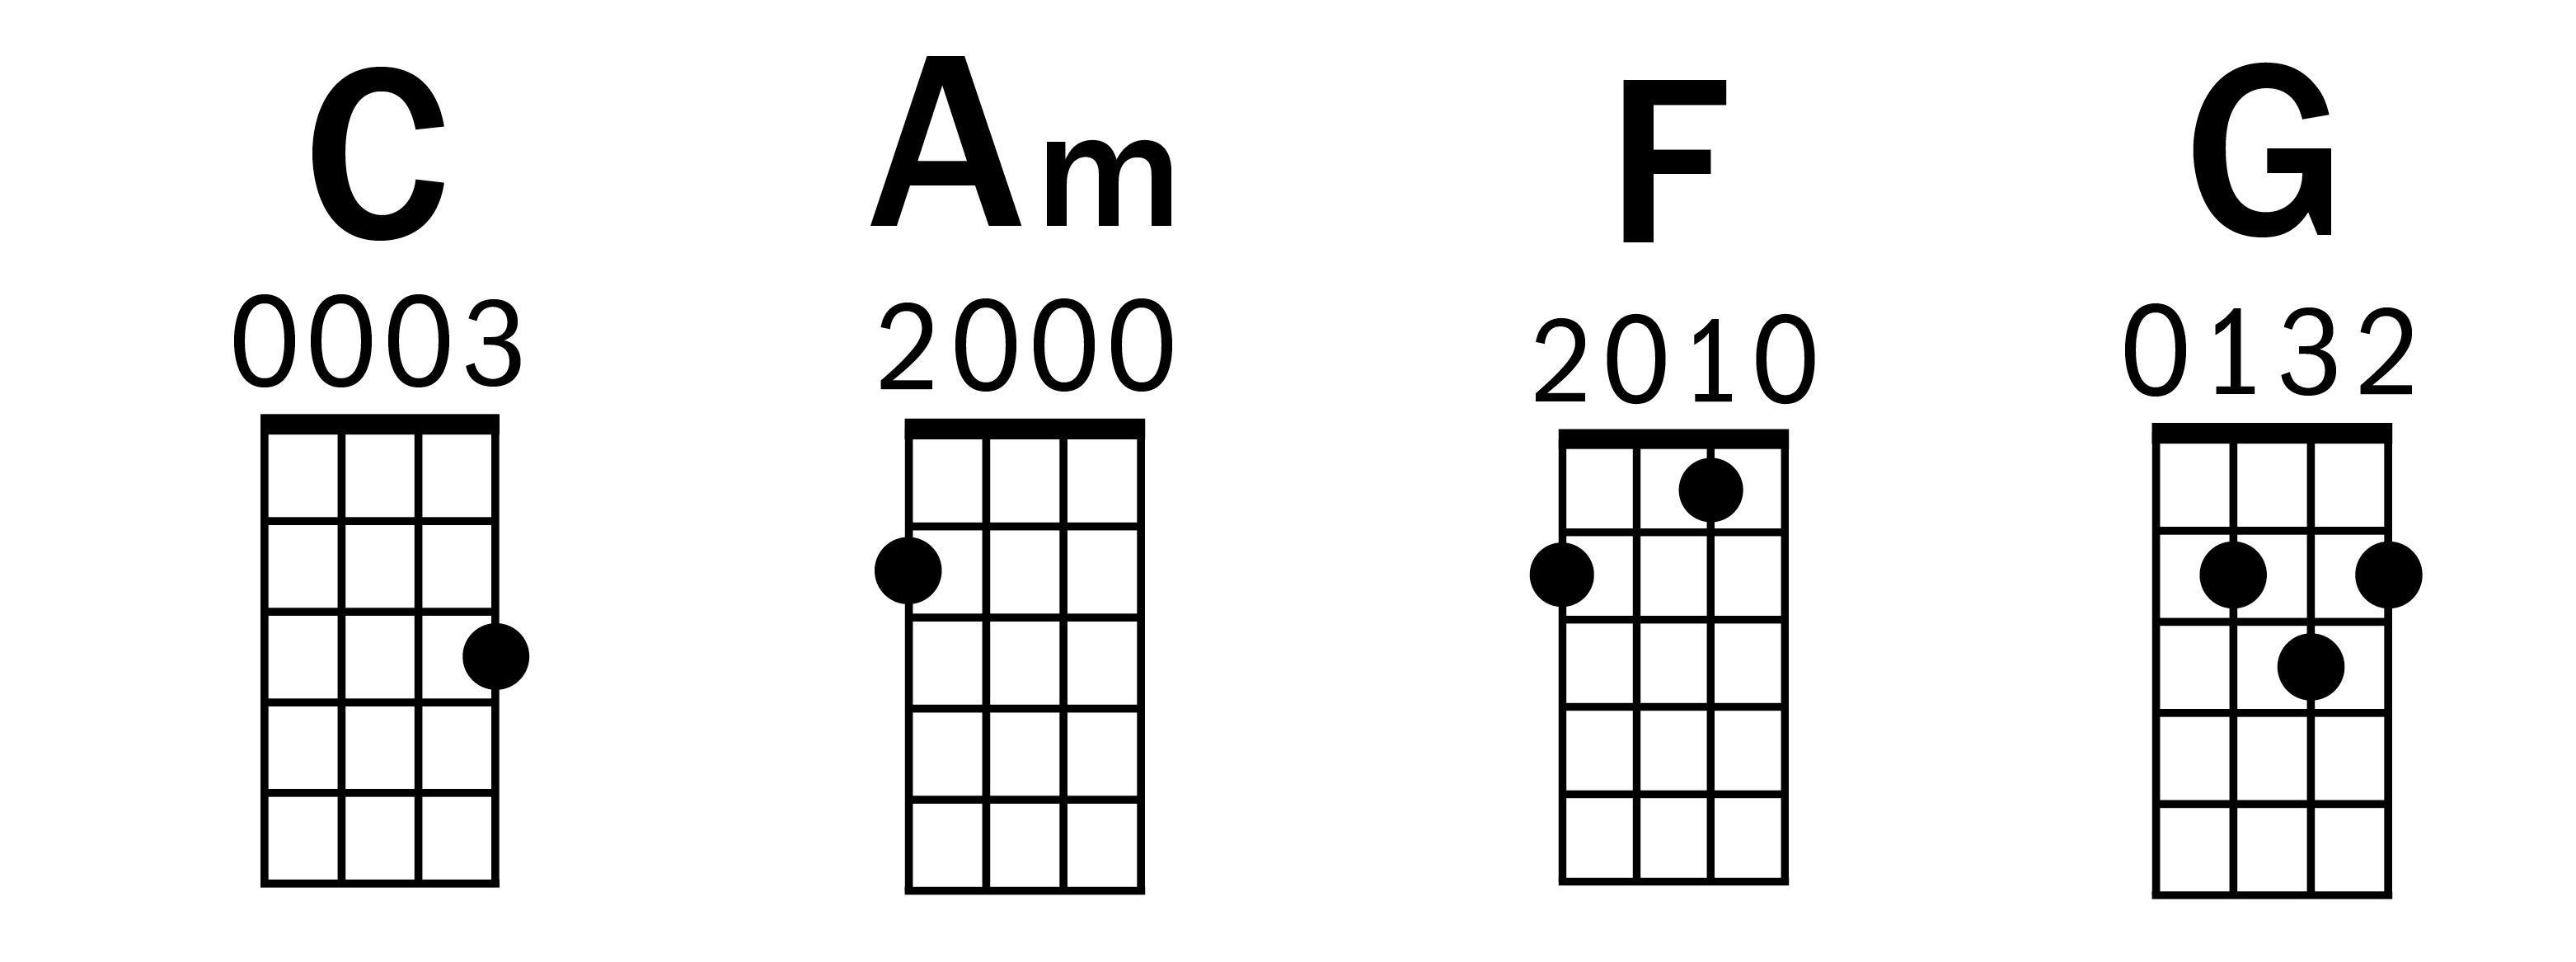 The Beatles Ukulele Lesson: Extended Chords Add Emotional